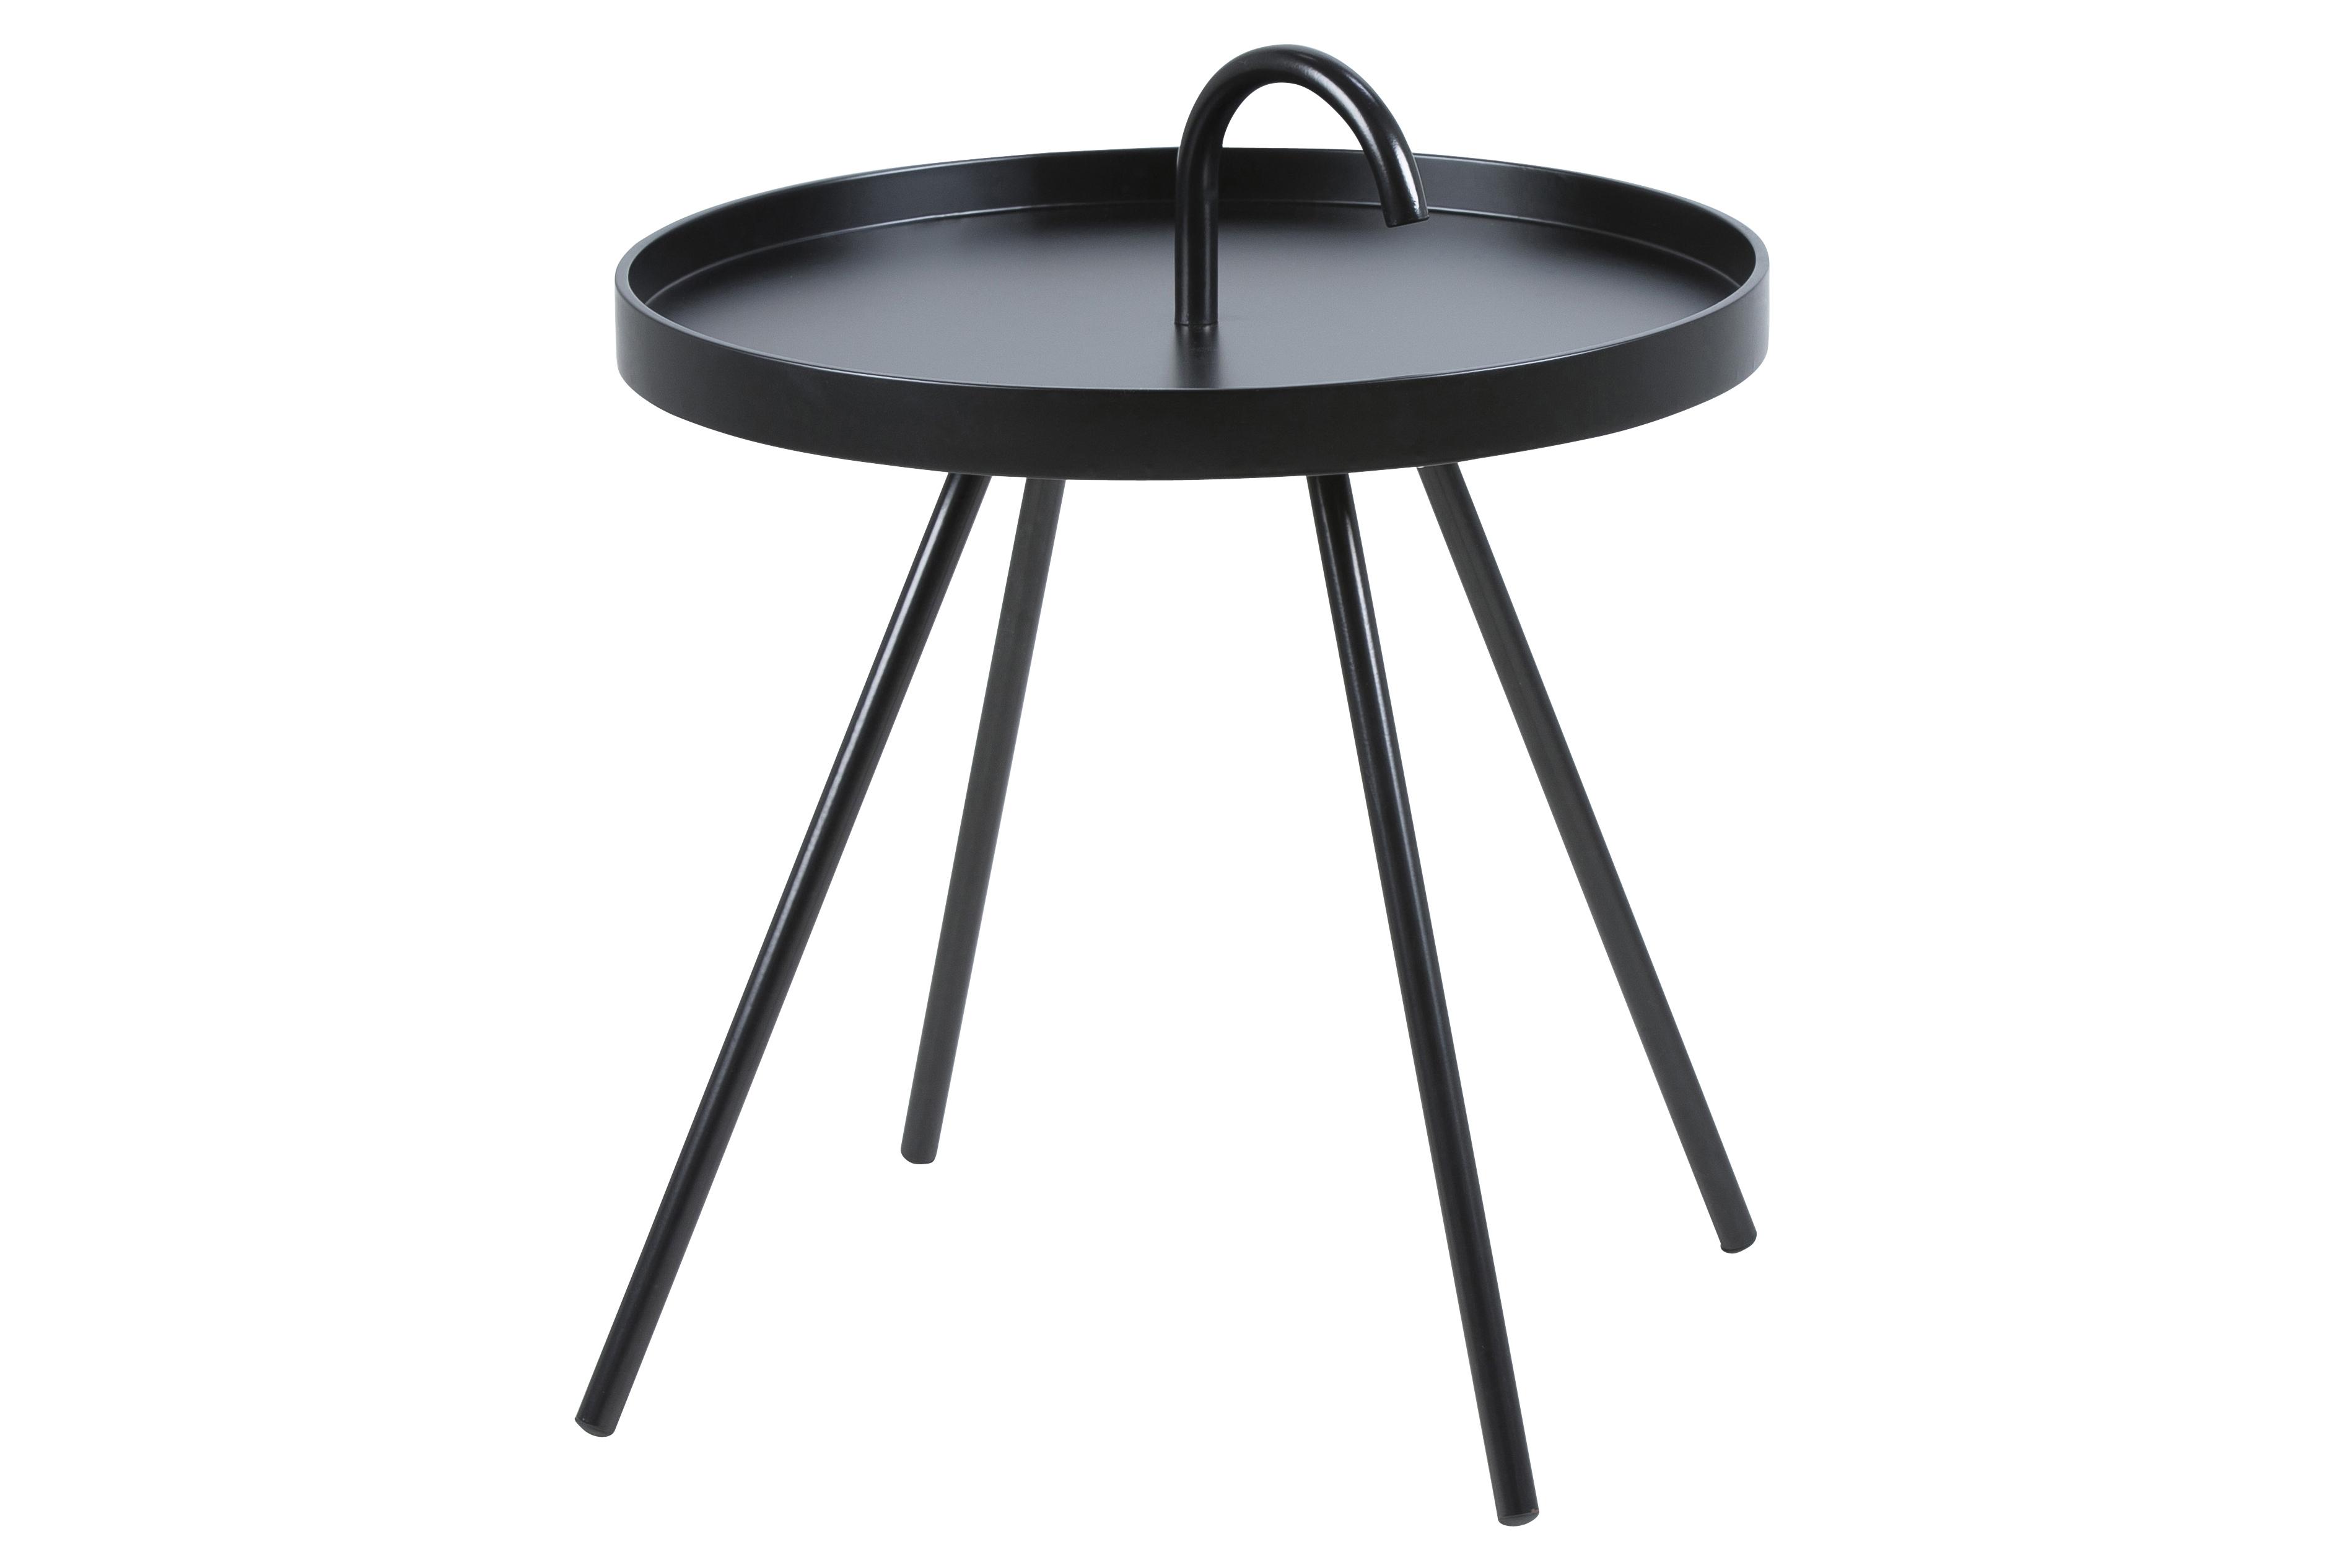 Masuta Din Mdf Si Metal Mico Black Ø51xh62 5 Cm